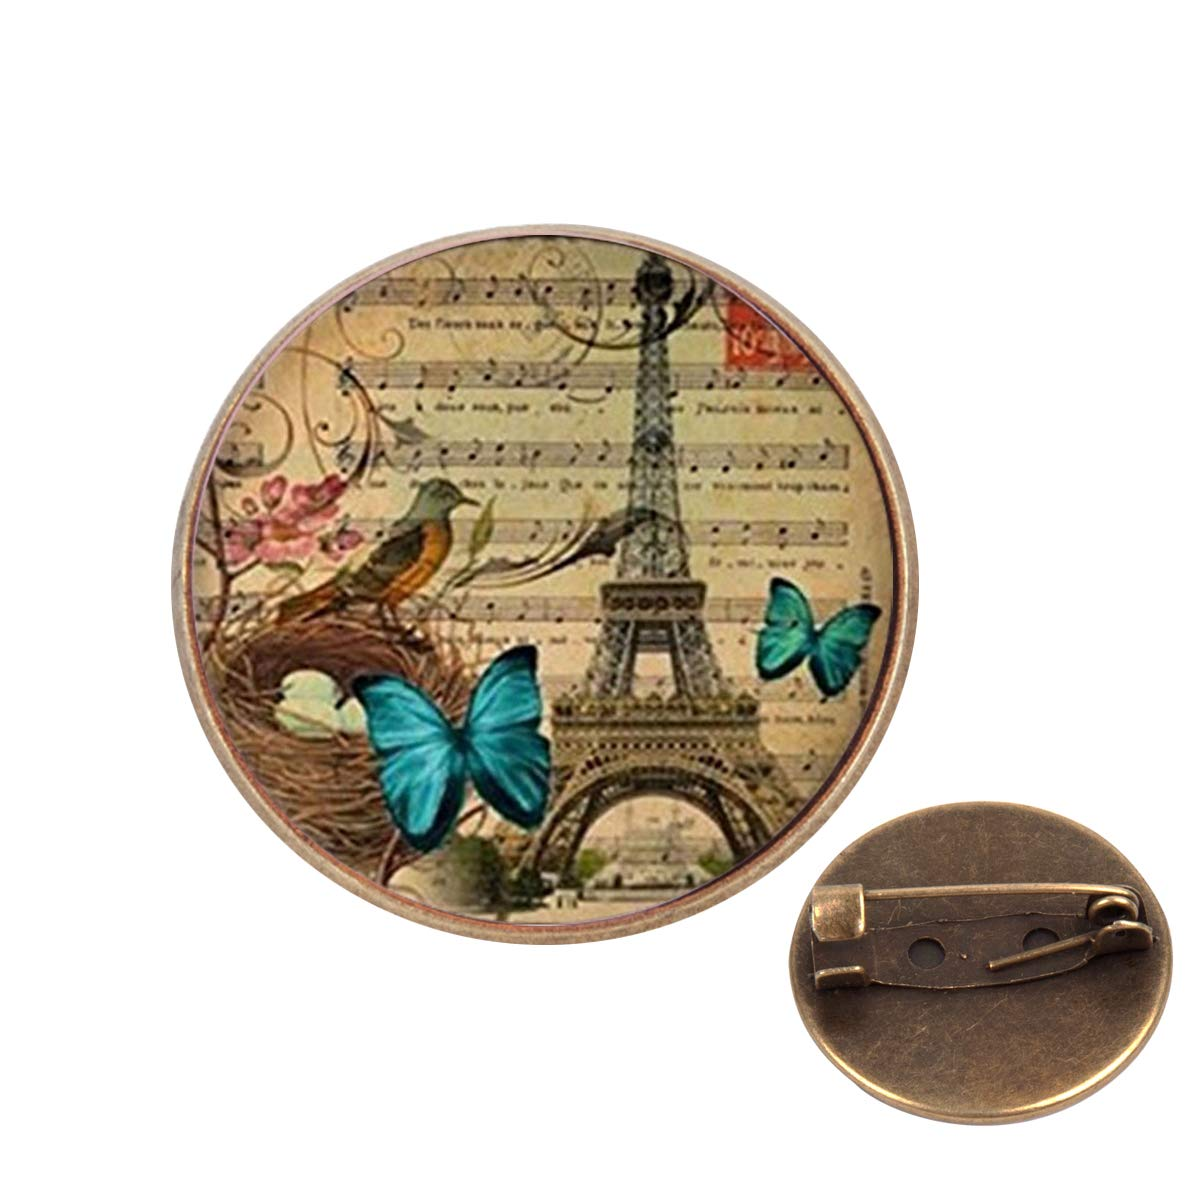 Pinback Buttons Badges Pins Vintage Butterfly Paris Eiffel Lapel Pin Brooch Clip Trendy Accessory Jacket T-Shirt Bag Hat Shoe